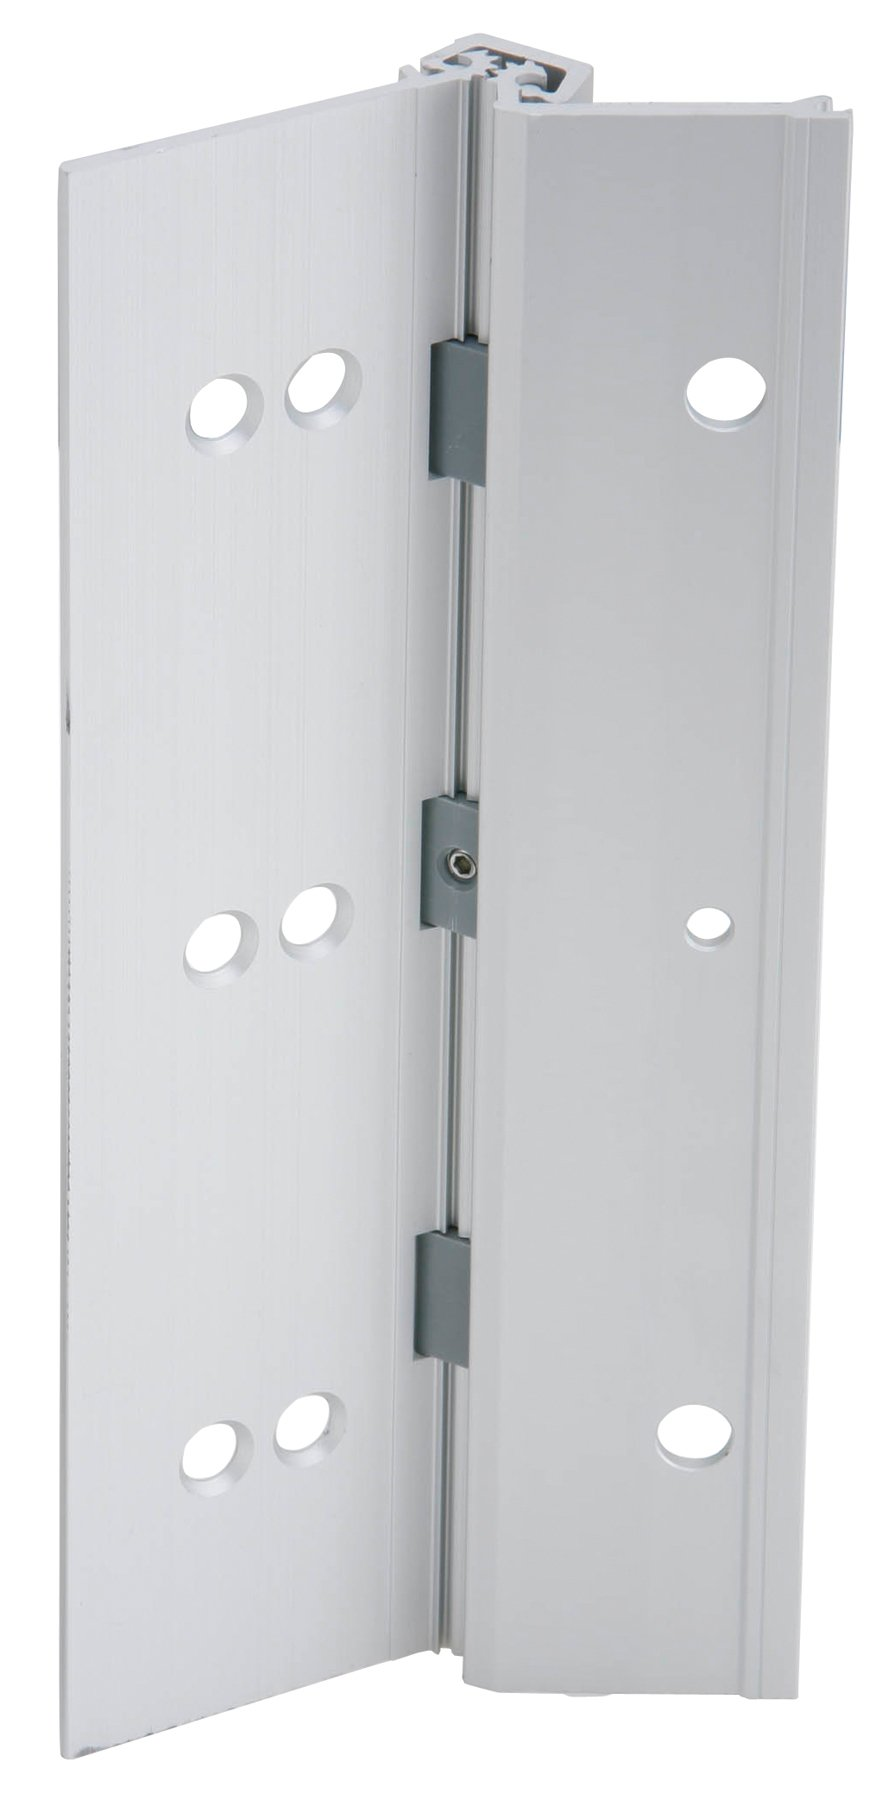 Ives 224HD US28 83'' Full Mortise Aluminum Geared Continuous Hinge, Satin Aluminum Finish, 48'' Open Width